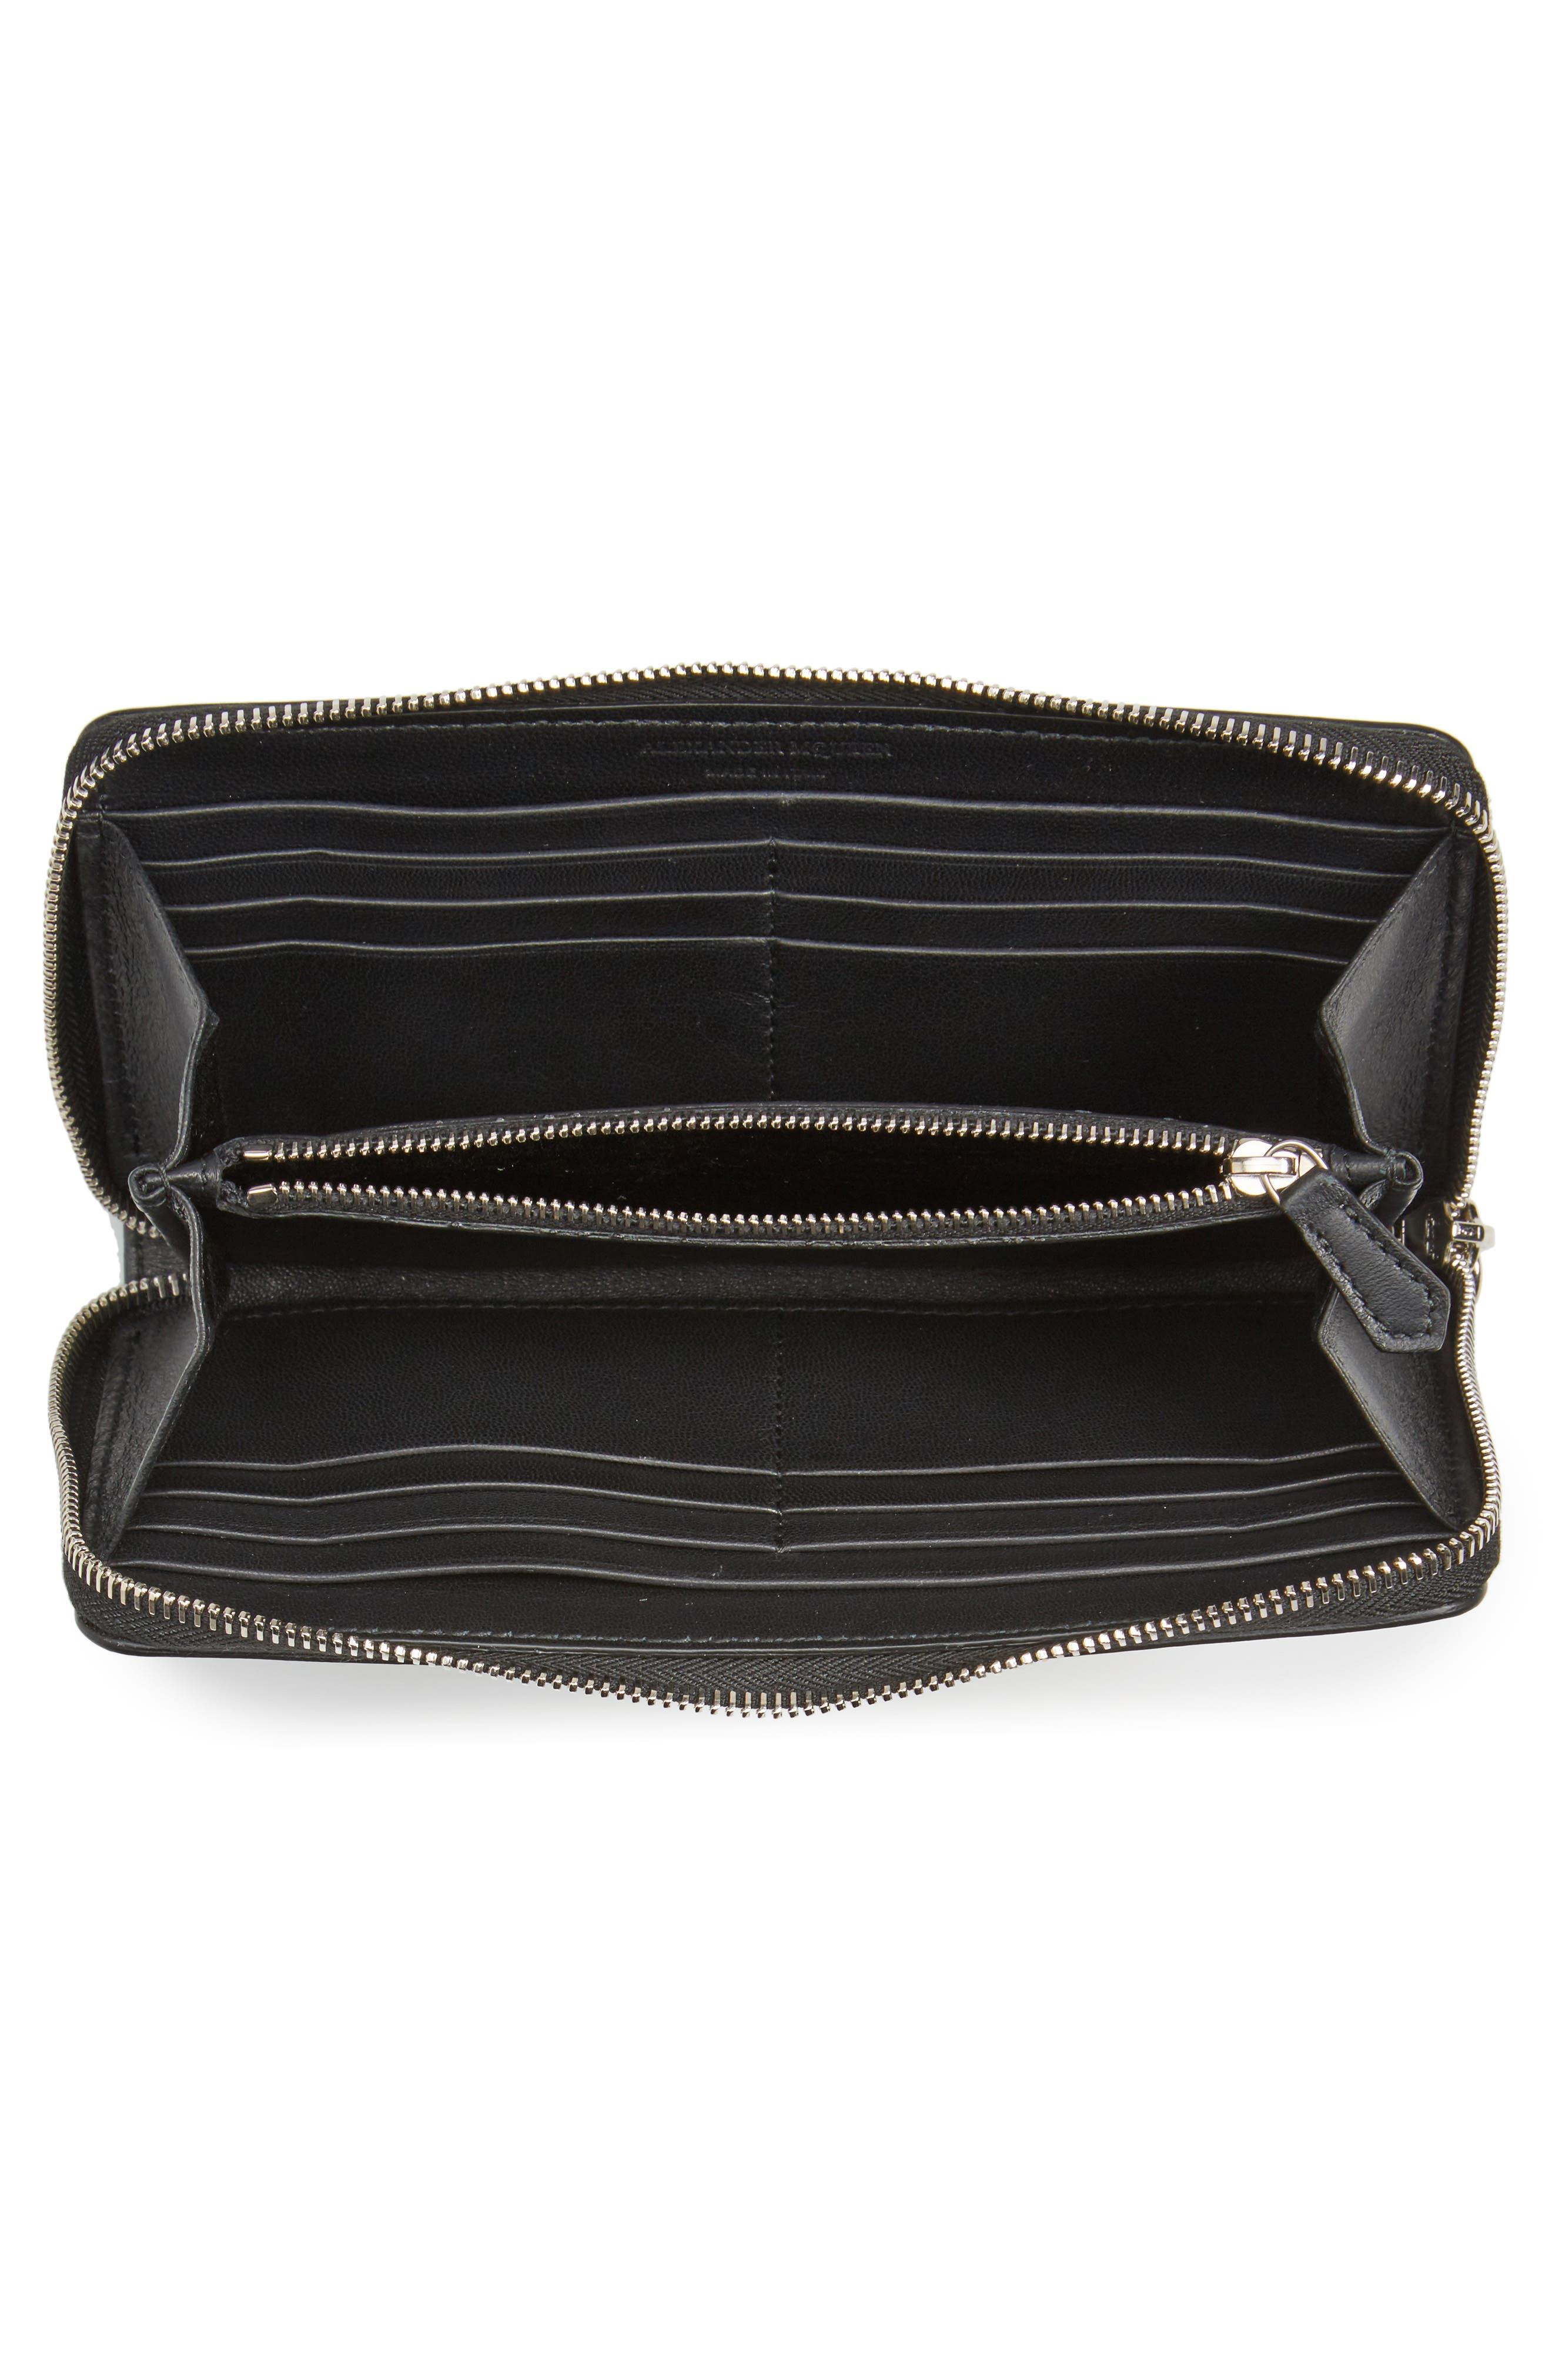 Grommet & Stud Calfskin Leather Continental Wallet,                             Alternate thumbnail 2, color,                             Black